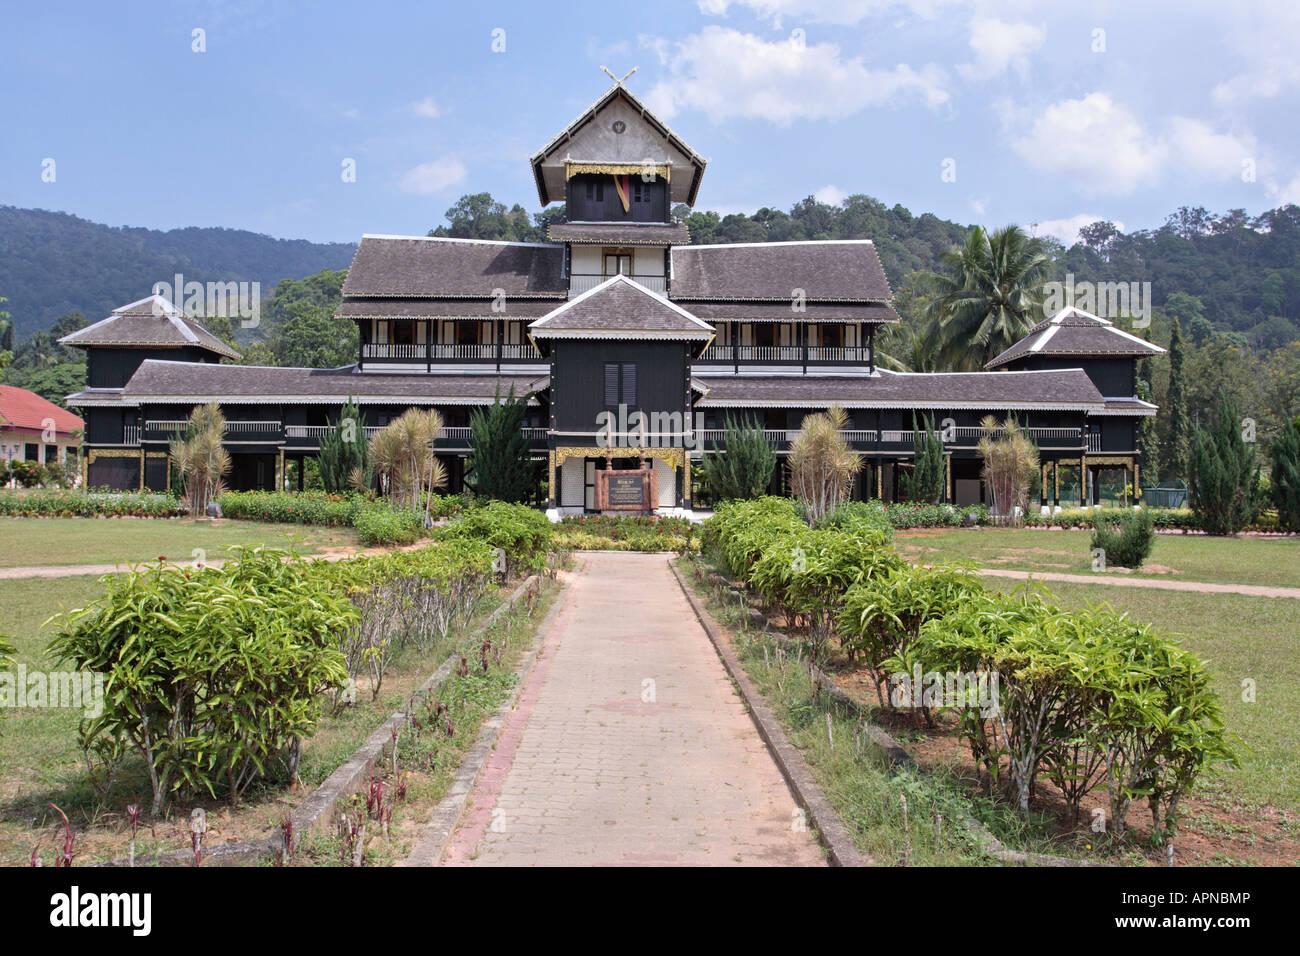 kuala pilah senior singles Single storey for rm 120 000 at kuala pilah, negeri sembilan 111 sqft 3 bedrooms, 2 bathrooms.